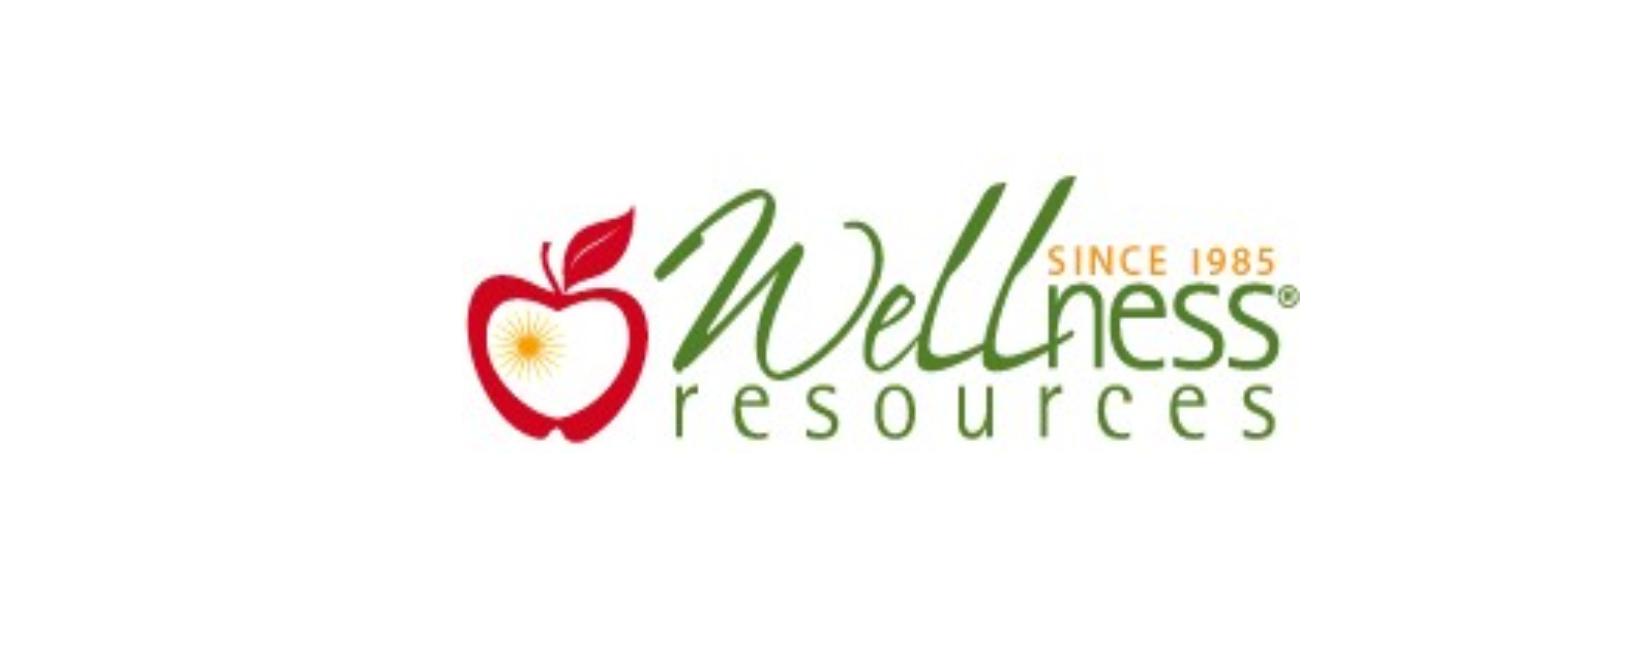 Wellness Resources Discount Code 2021